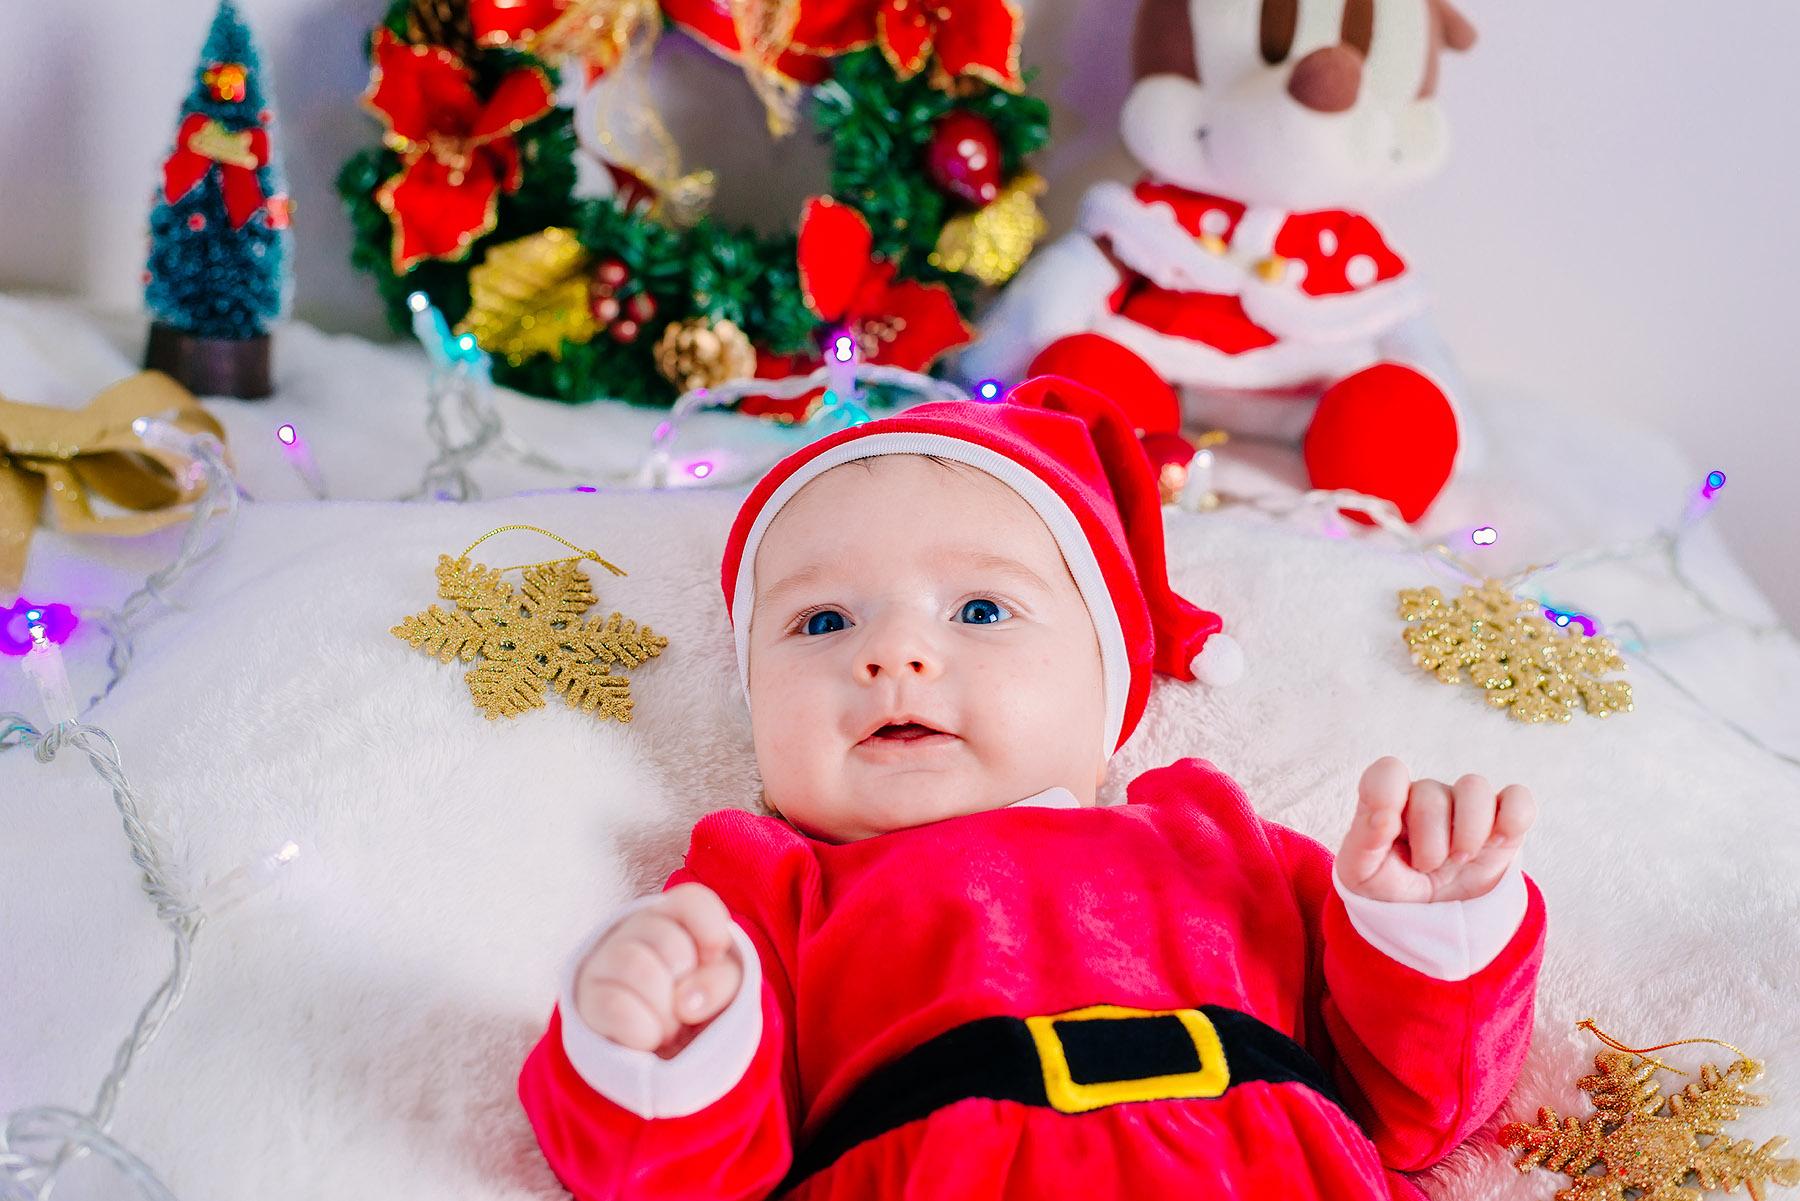 Santa Claus' little friend